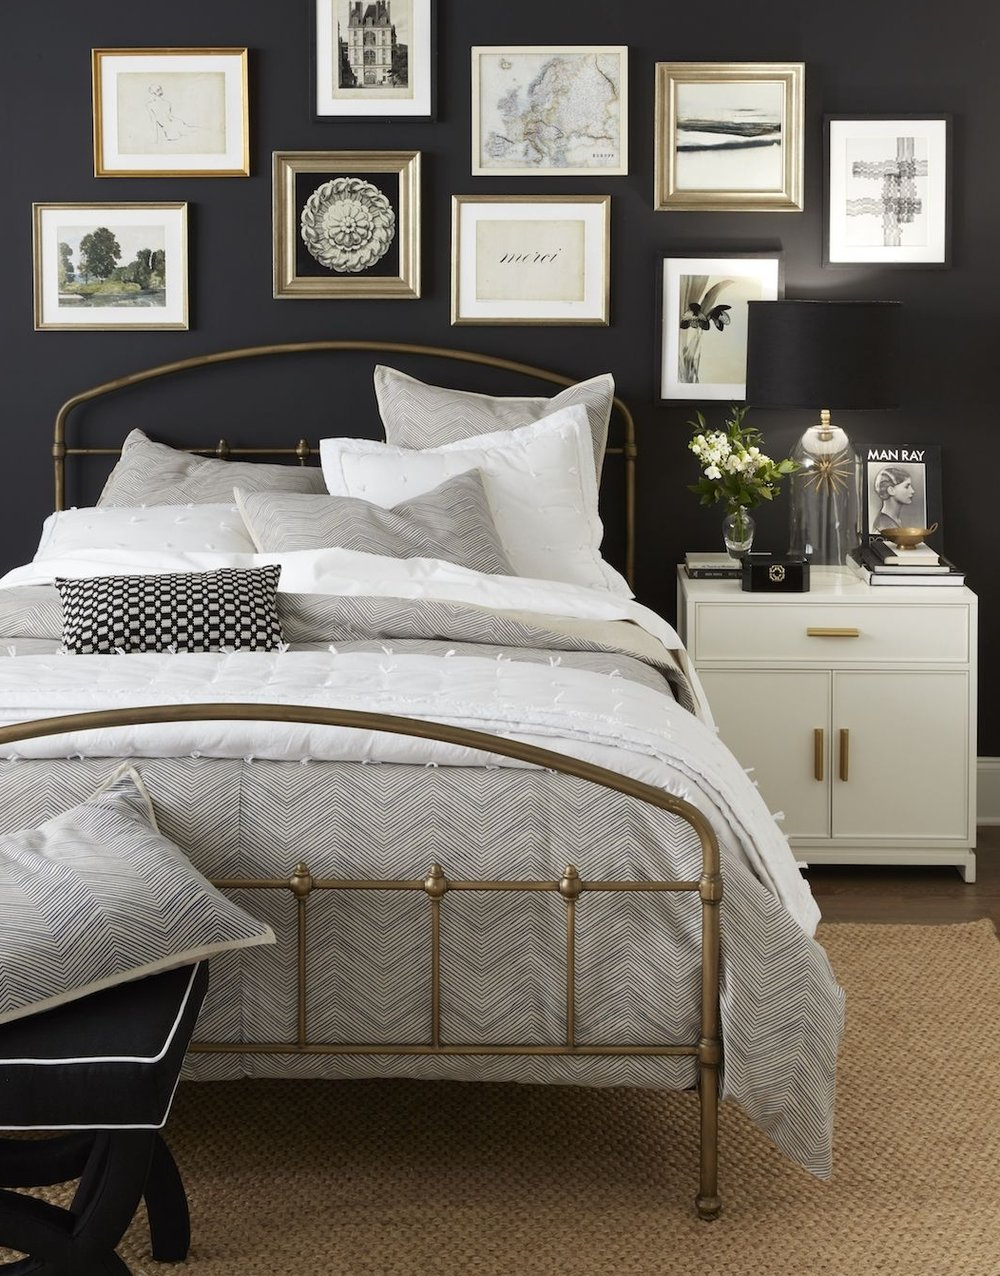 Ballard Designs: Bed Styling